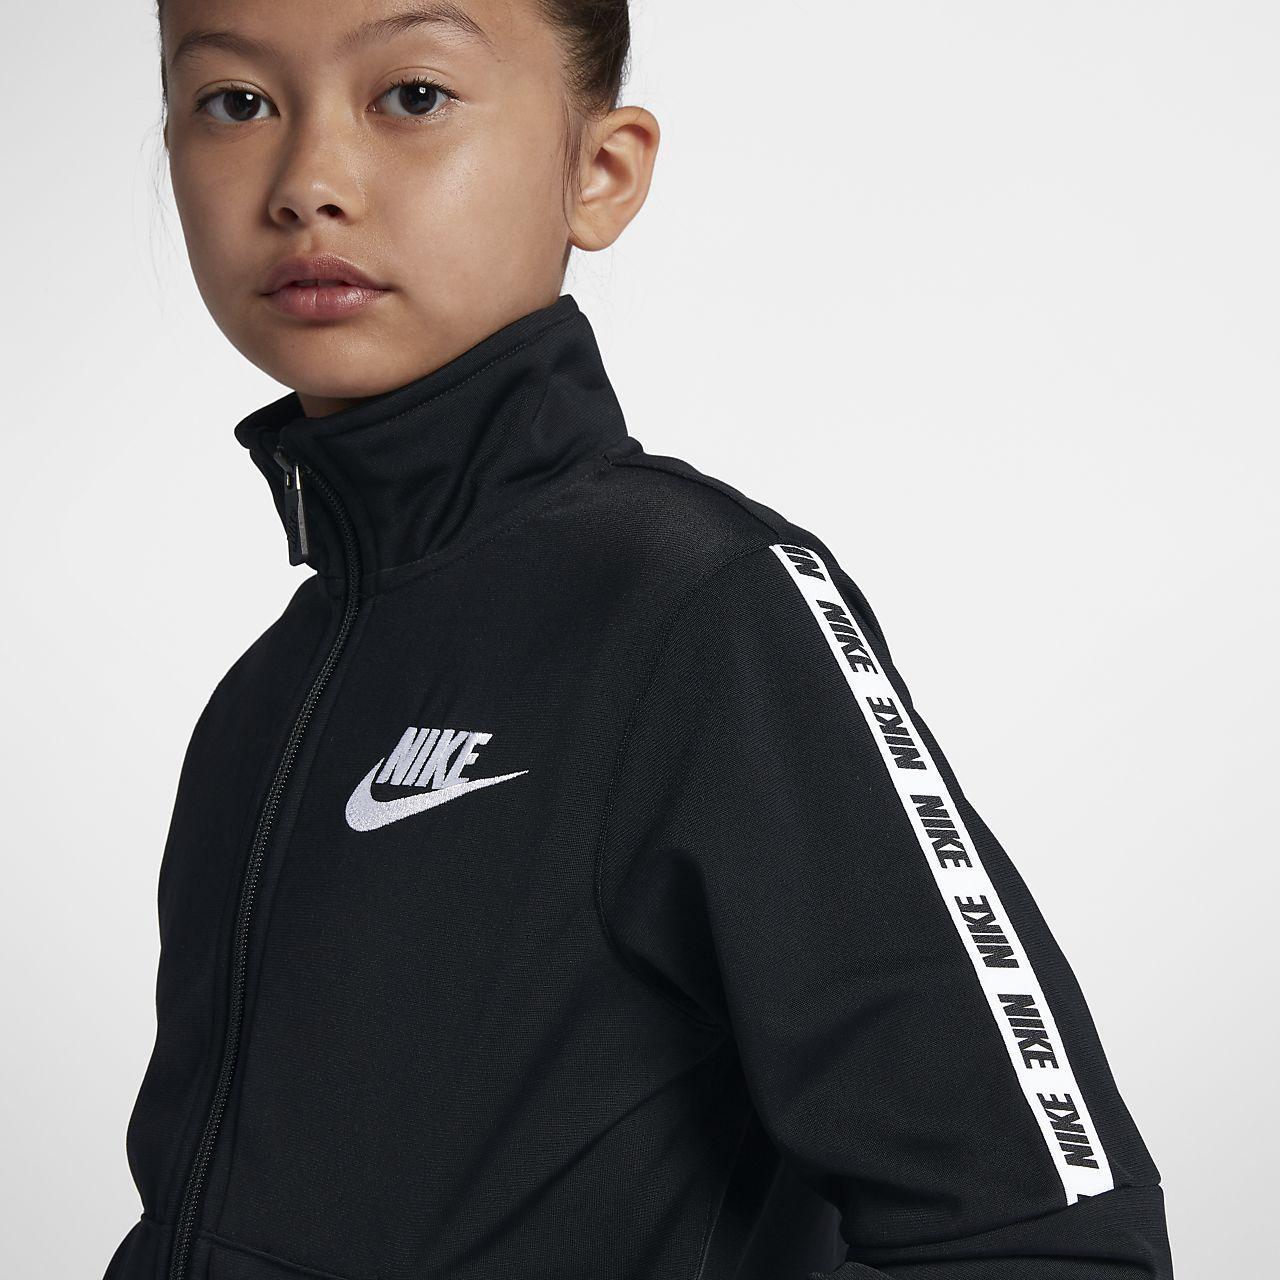 de6f95fd Nike Sportswear Big Kids' (Girls') Tracksuit. Nike.com